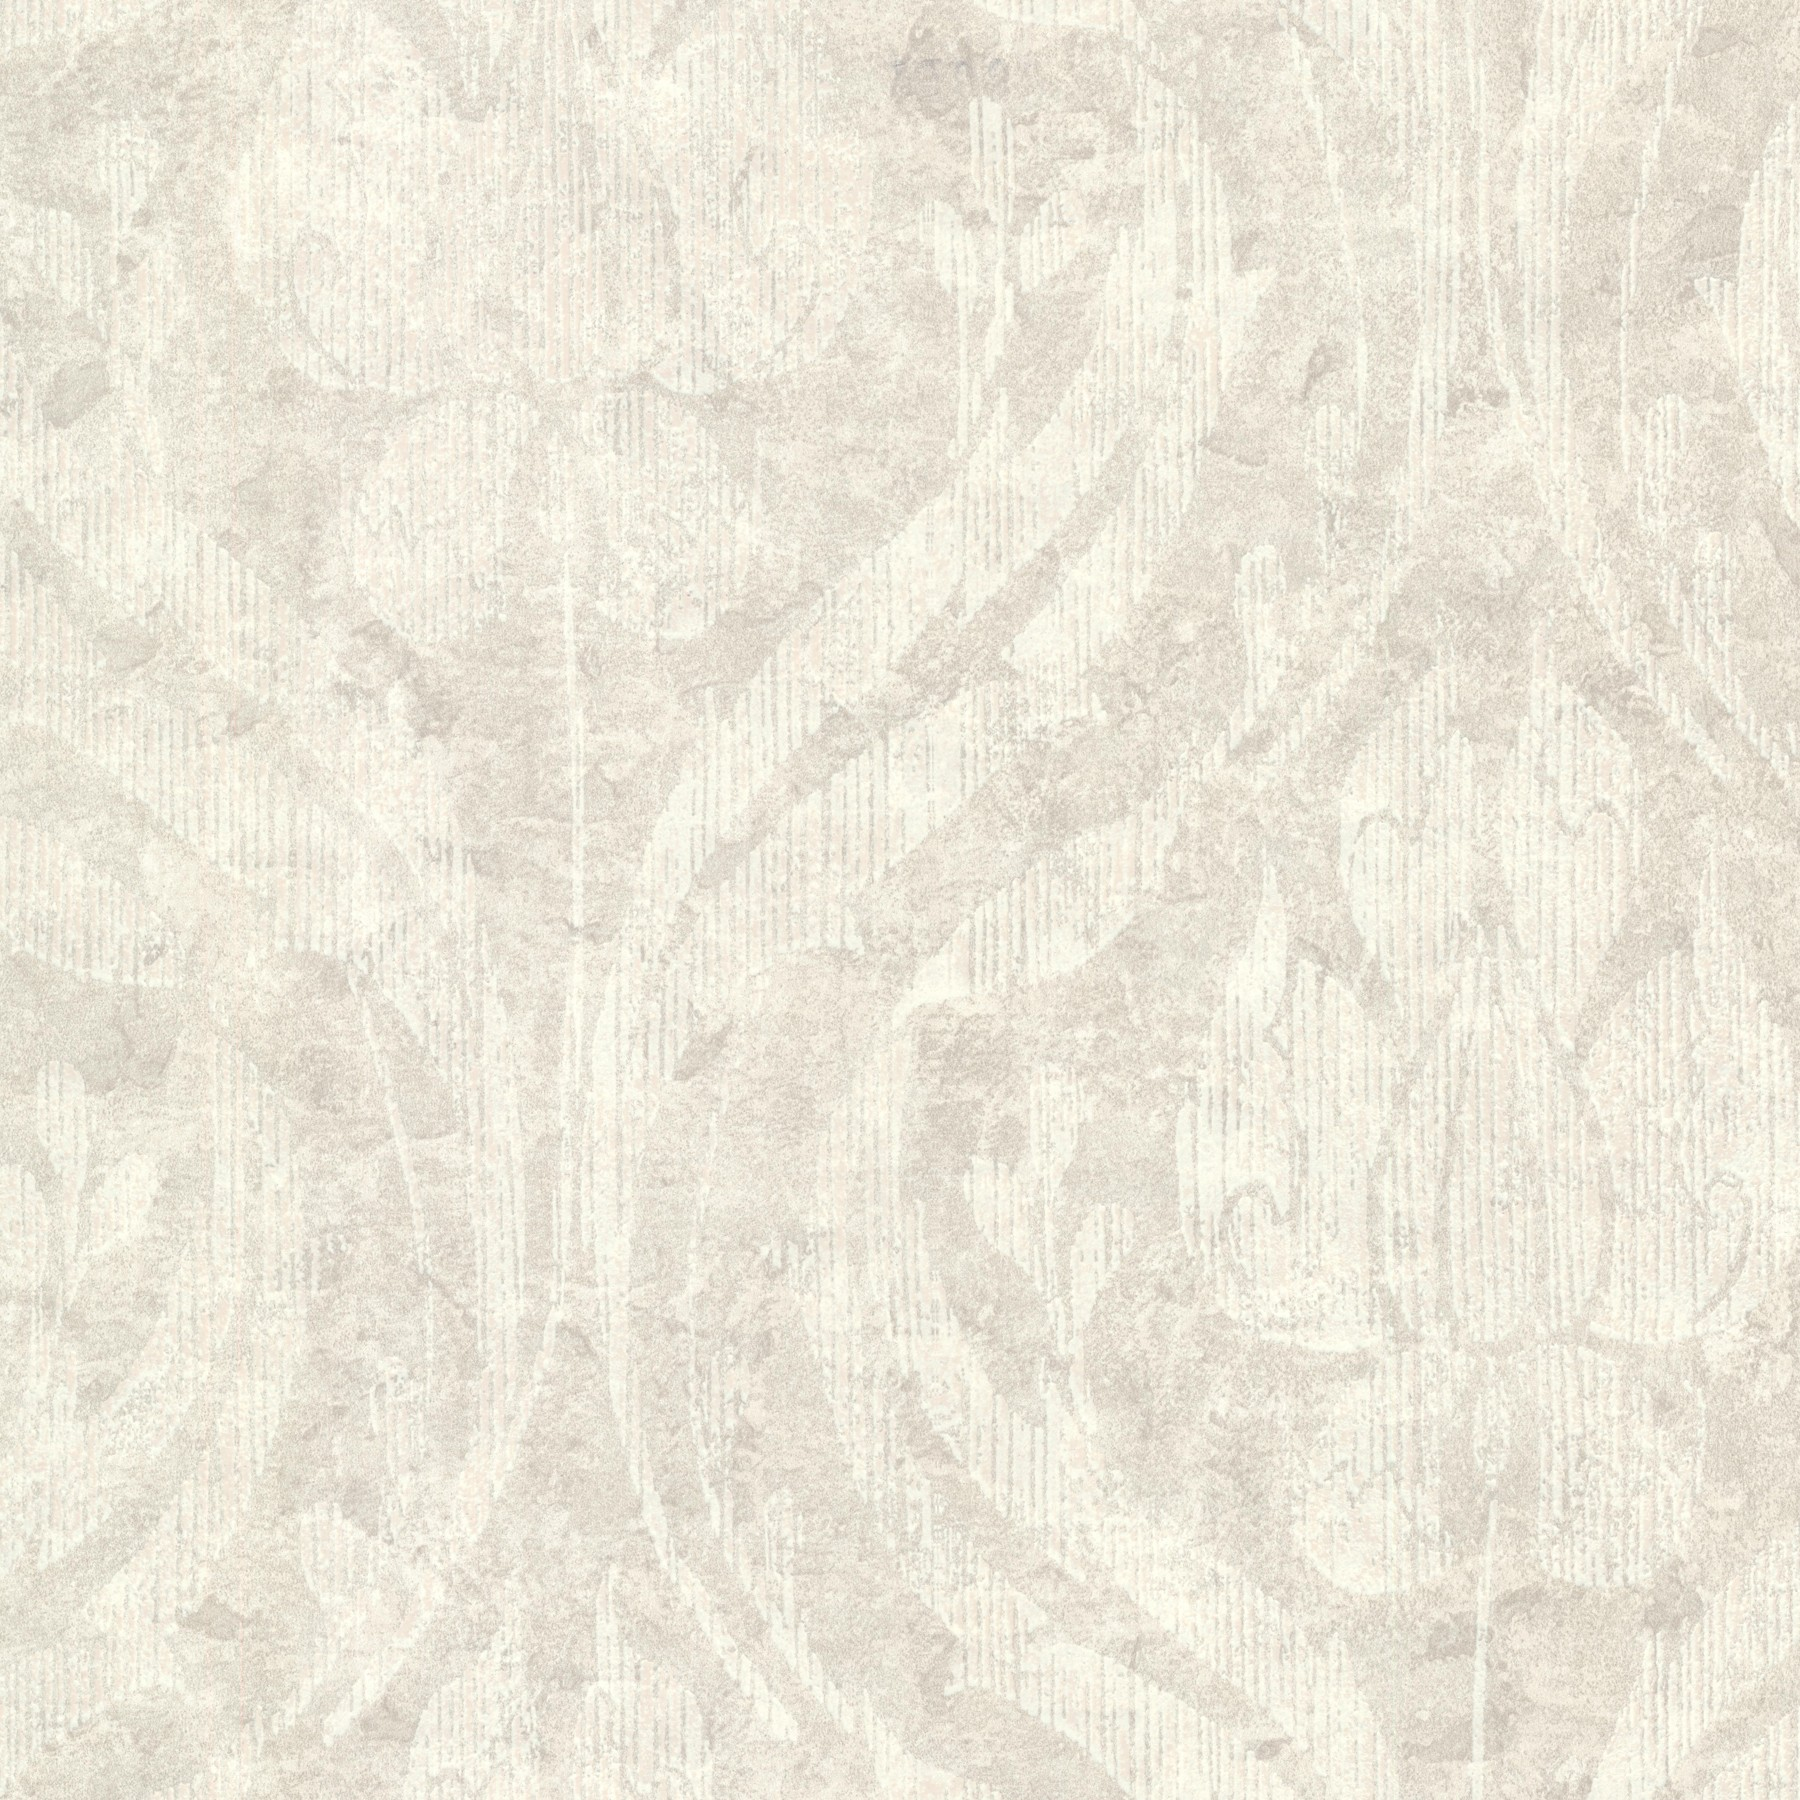 tapete onyx vliestapete rasch textil 020034 barock beige grau